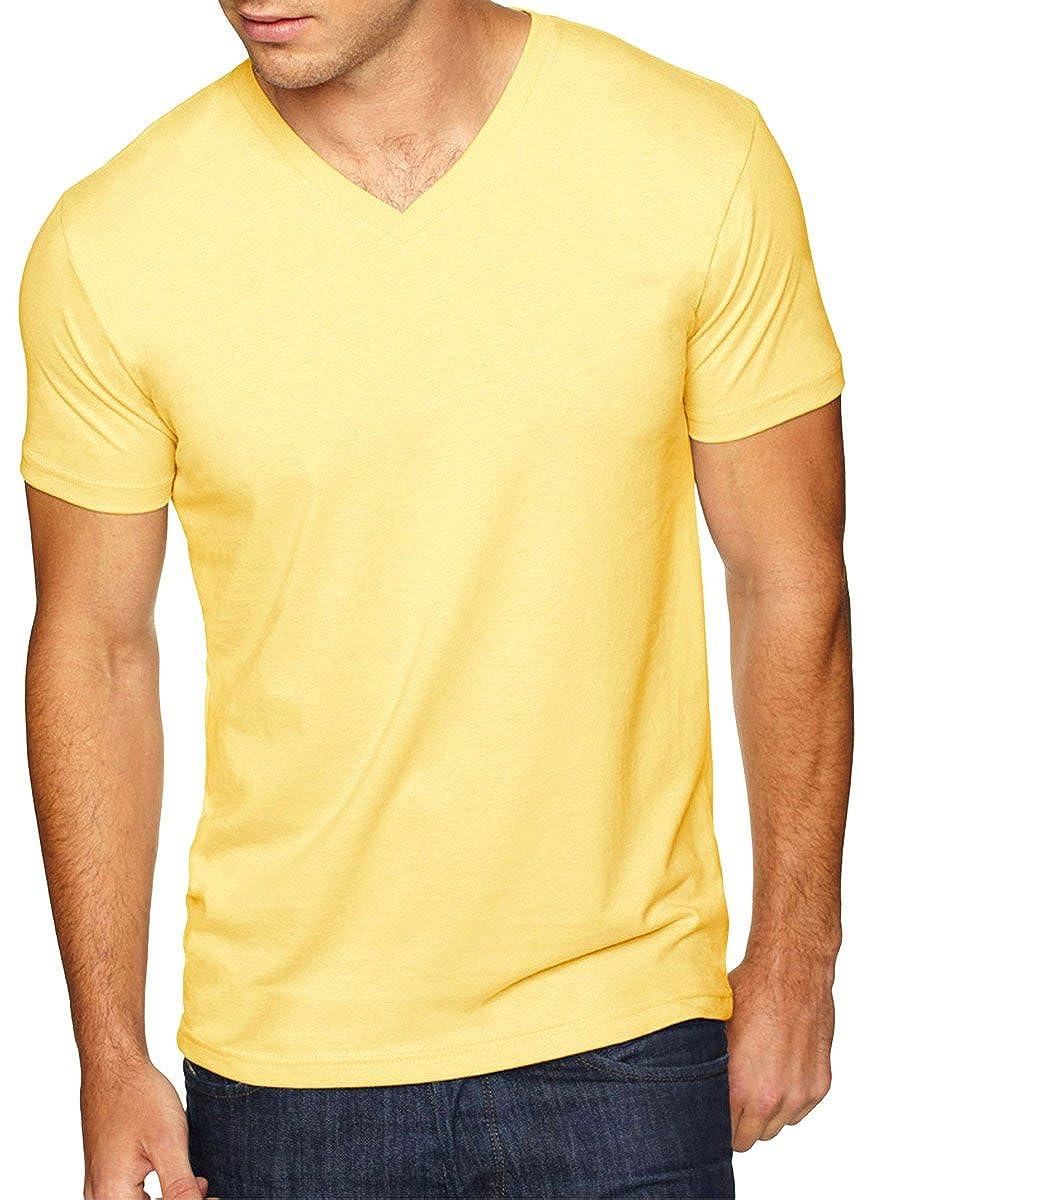 BANANA CREAM Next Level Mens Premium Sueded Short Sleeve V-Neck T-Shirt XL